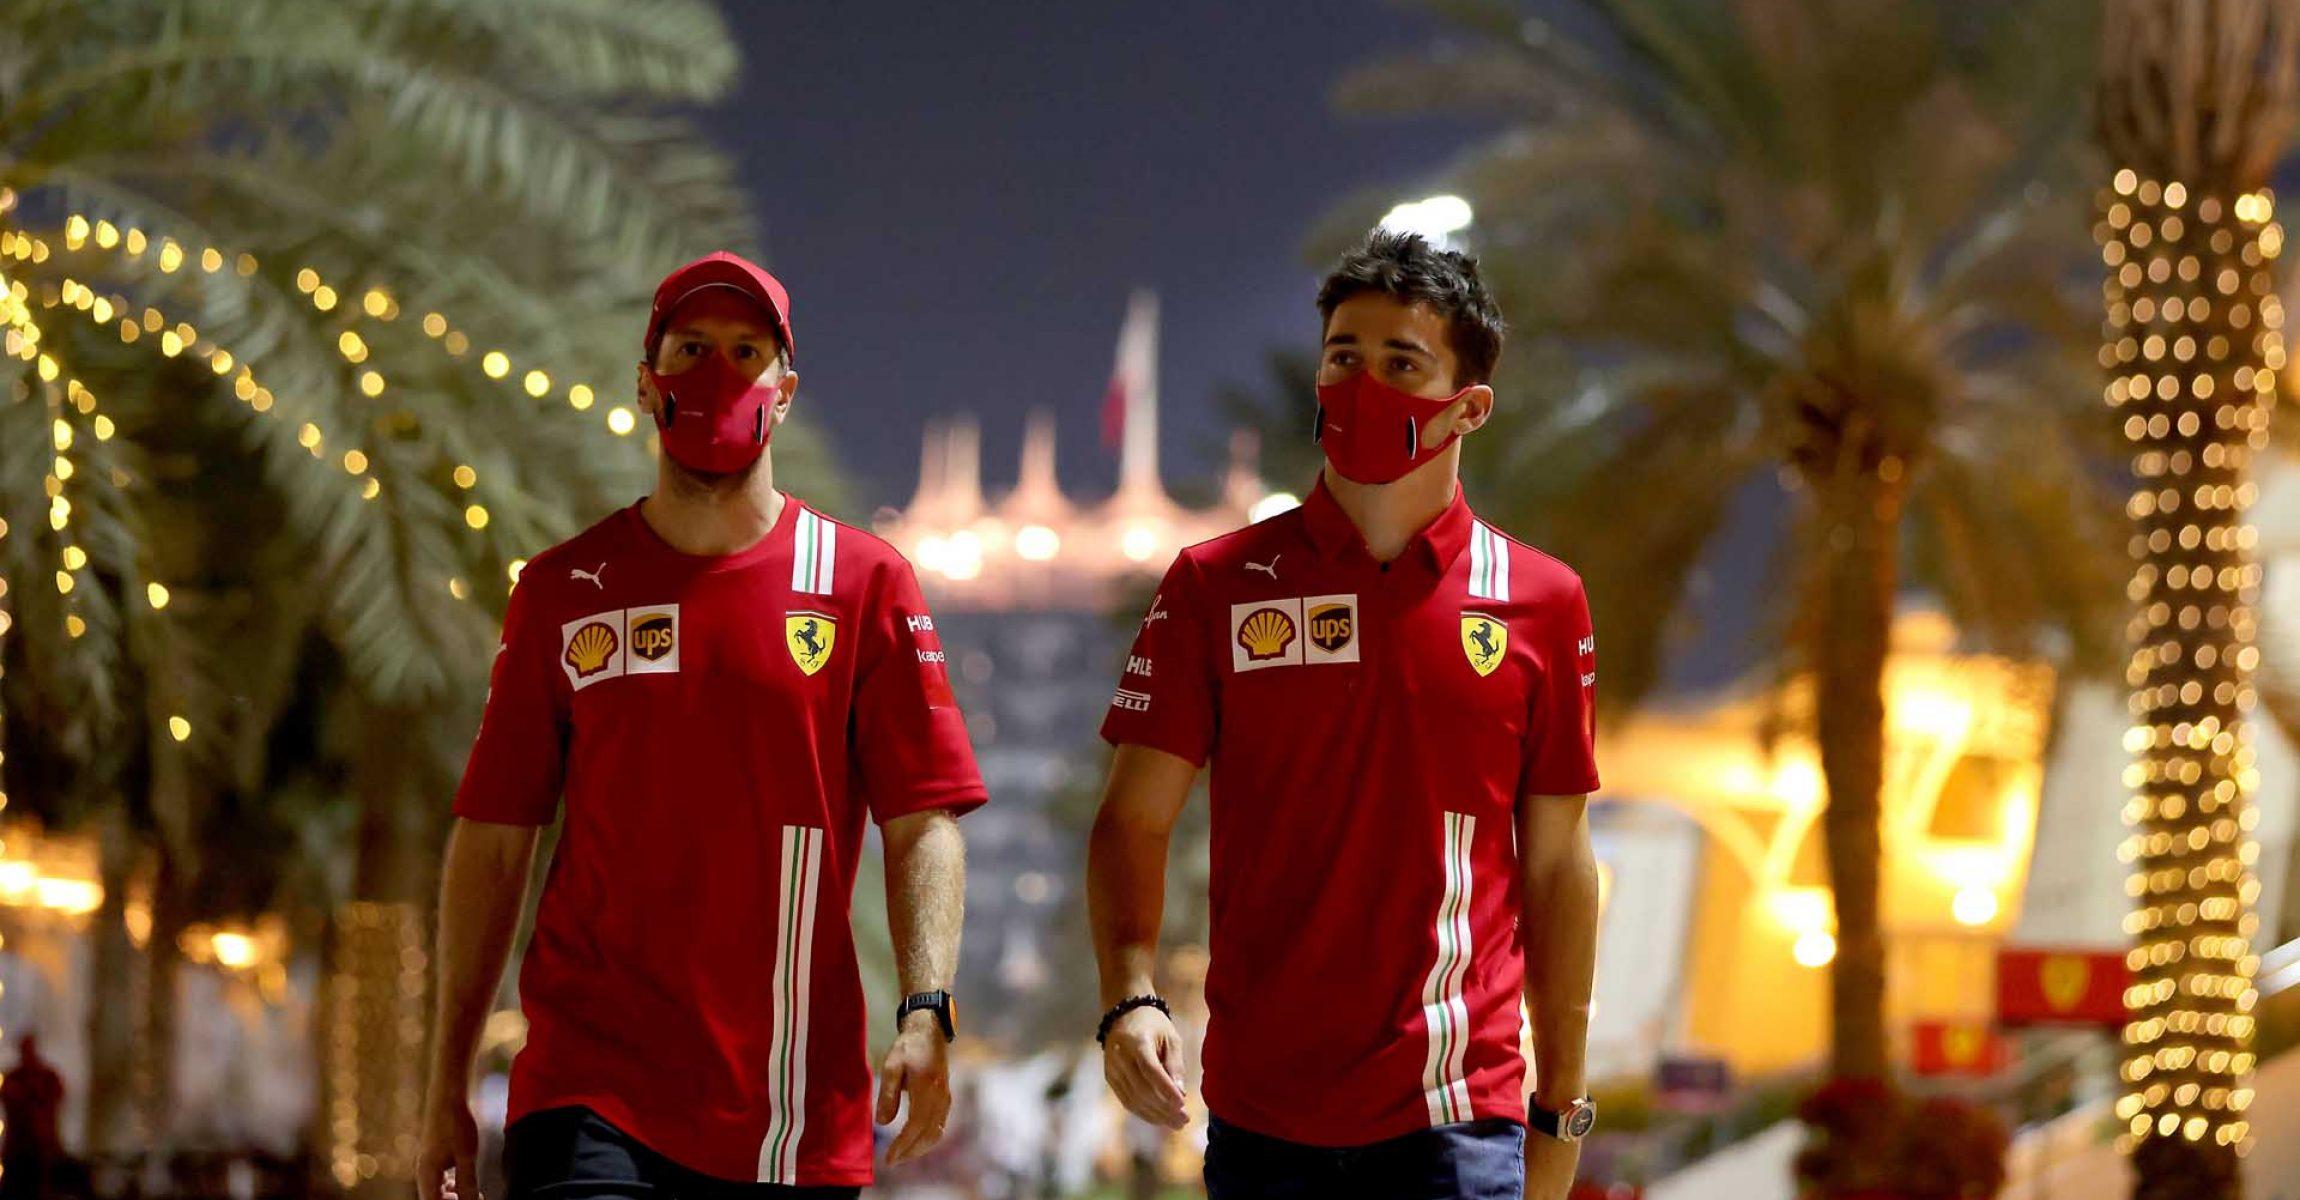 GP SAKHIR  F1/2020 - GIOVEDÌ 03/12/2020      credit: @Scuderia Ferrari Press Office Sebastian Vettel Charles Leclerc